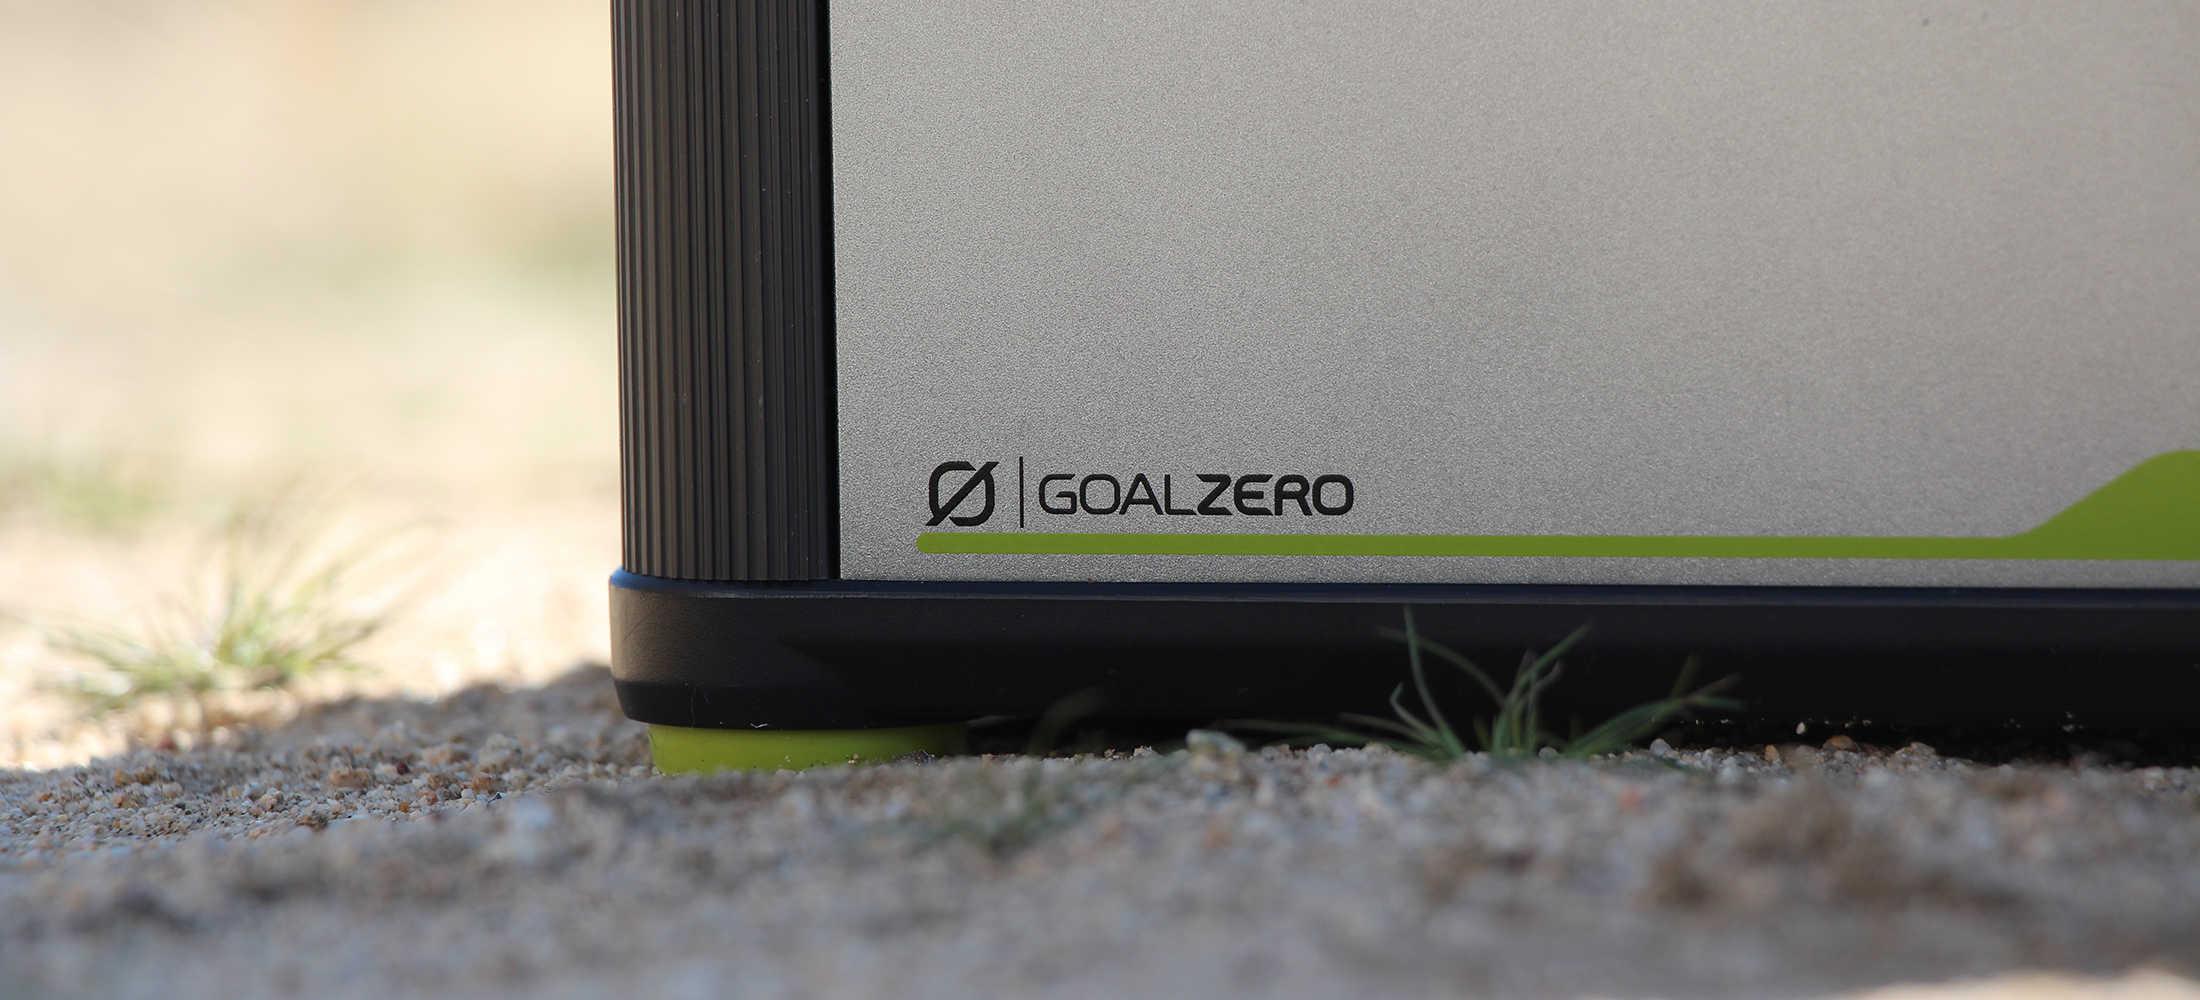 goal-zero-yeti-500x-power-station-solar-generator-overview-review-new-2020-the-solar-addict